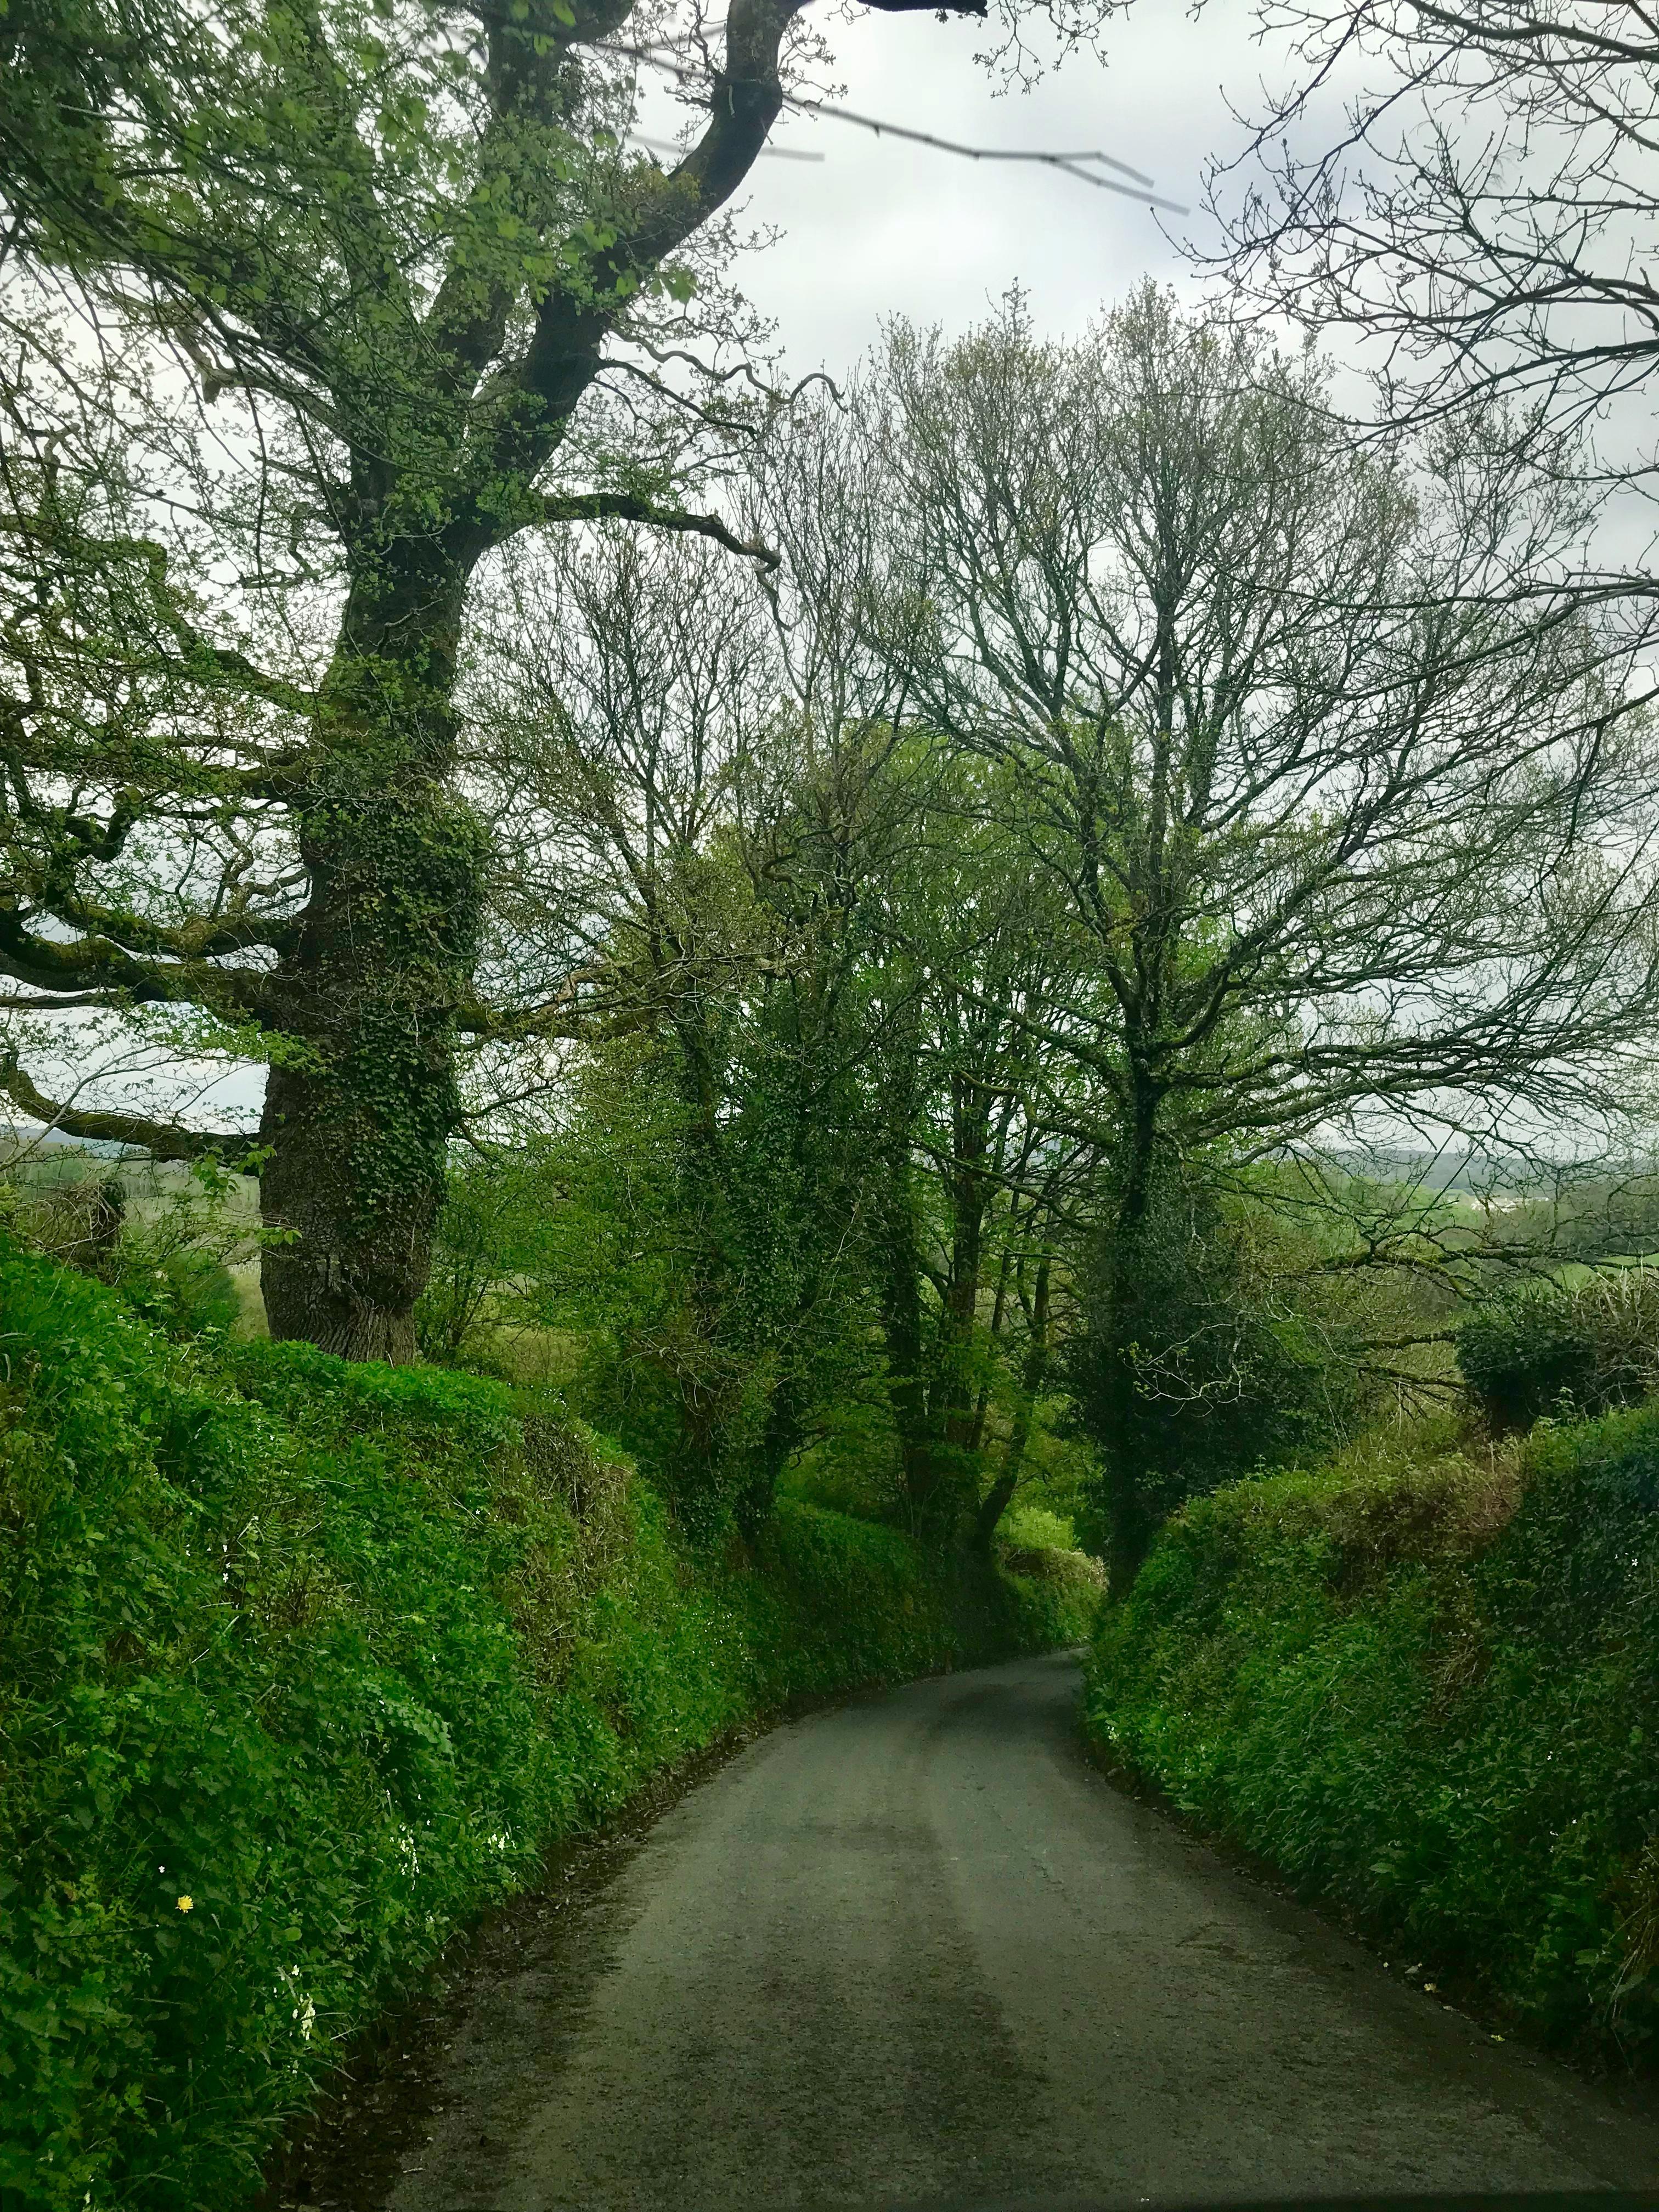 visit to Cornwall